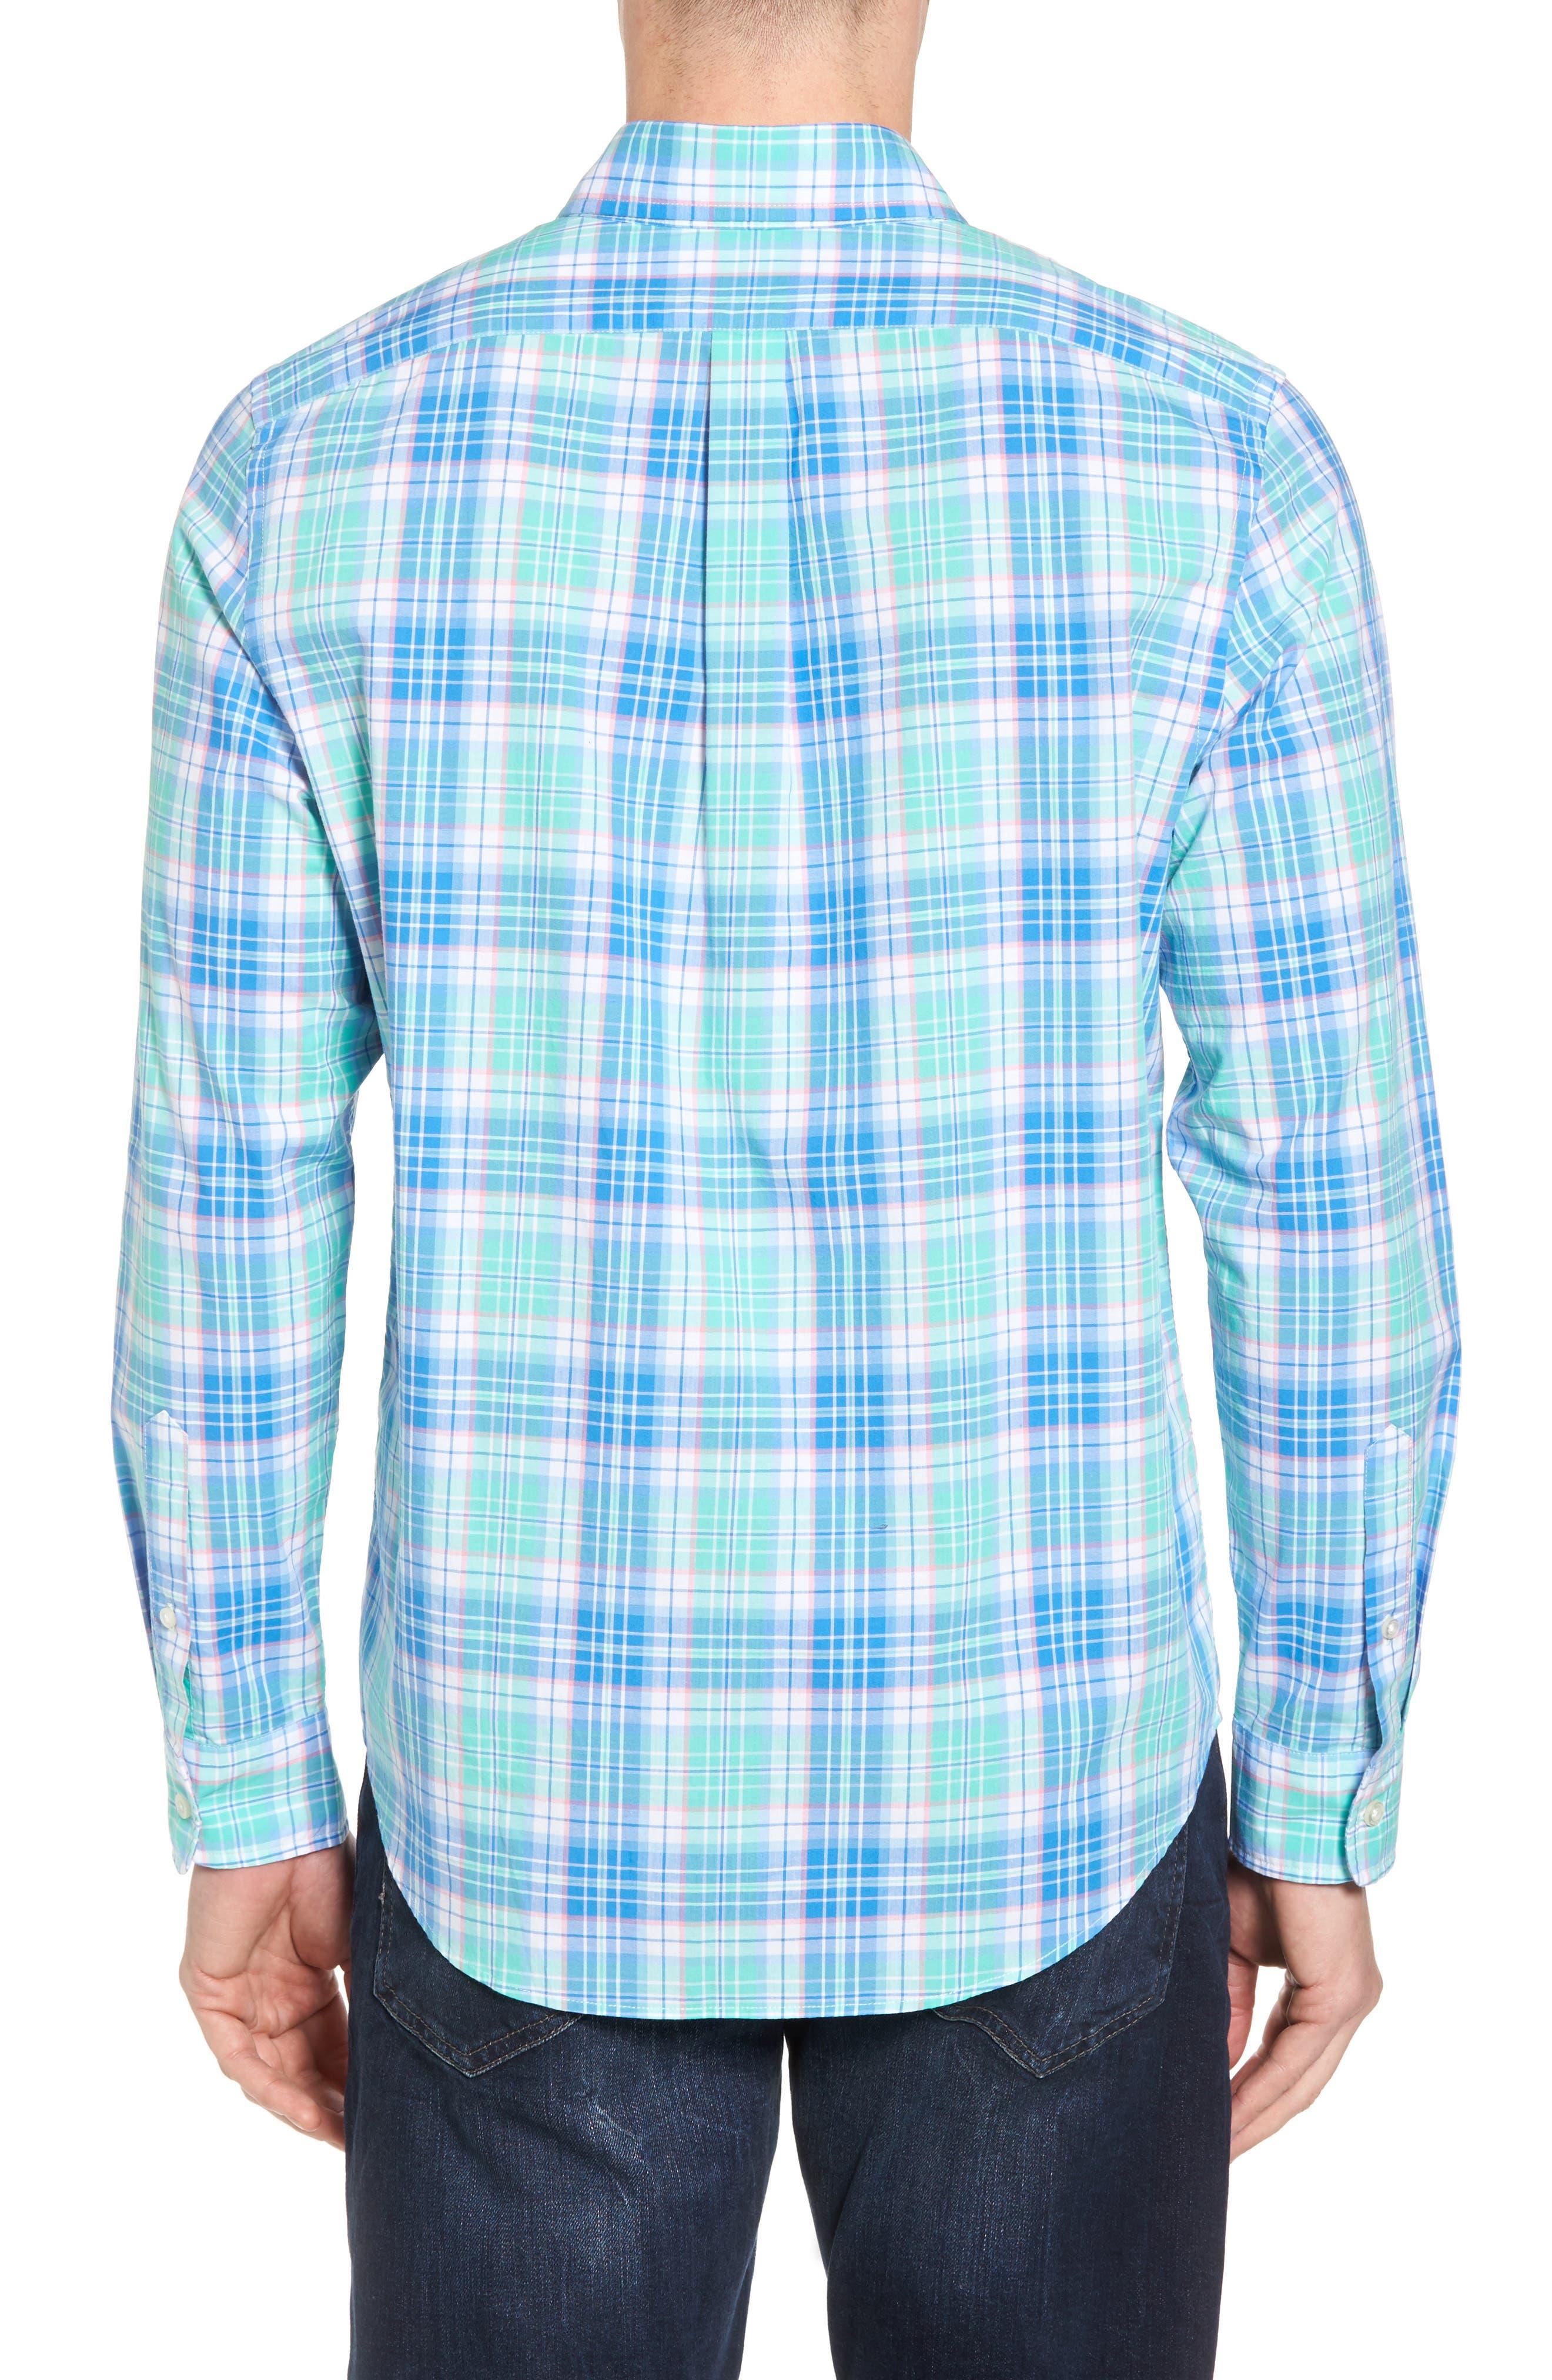 Sutherland Road Slim Fit Plaid Sport Shirt,                             Alternate thumbnail 2, color,                             359